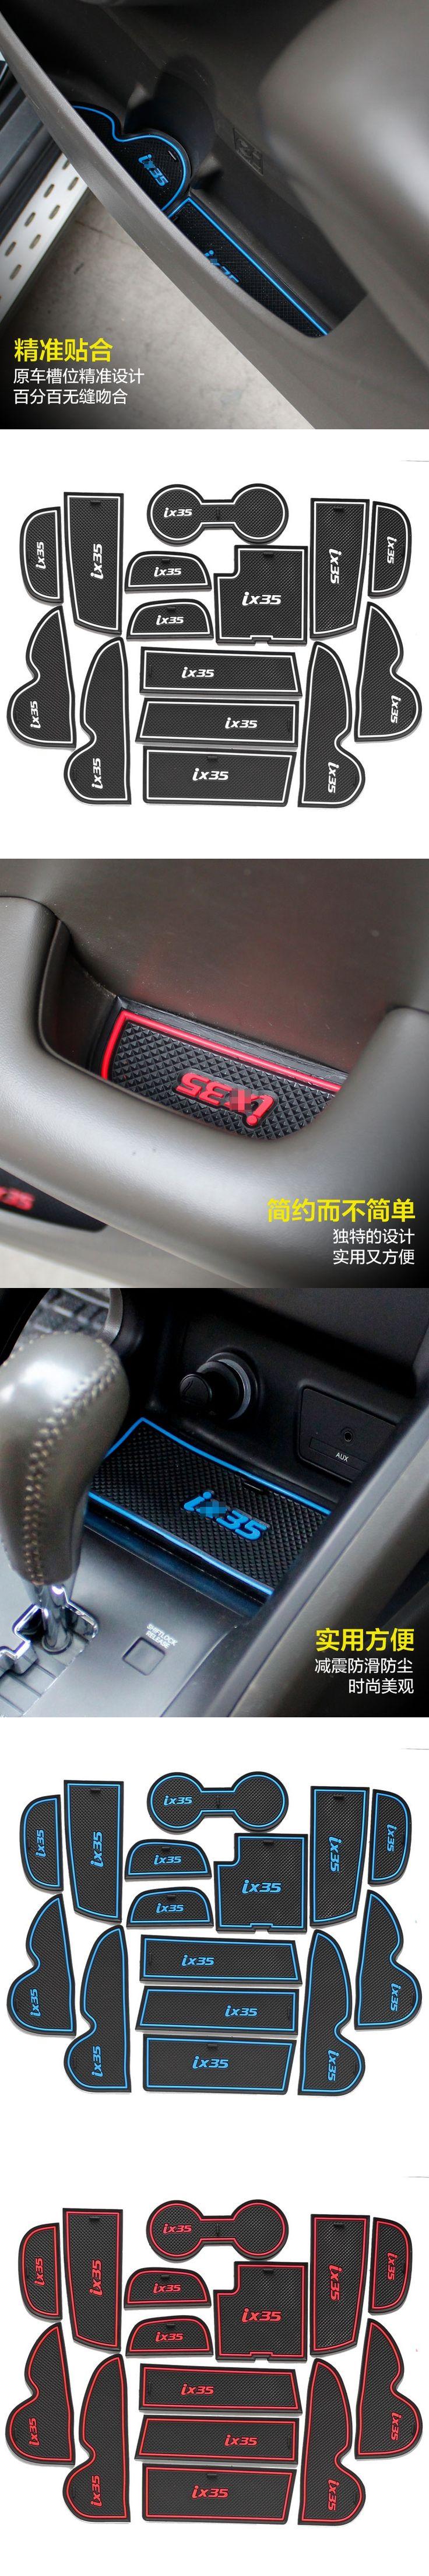 For Hyundai IX35 2009-12 2013-16 Anti Slip Rubber Mats Auto Motive Interior Car Parts Door Pad Carpets Gate Slot Car Styling